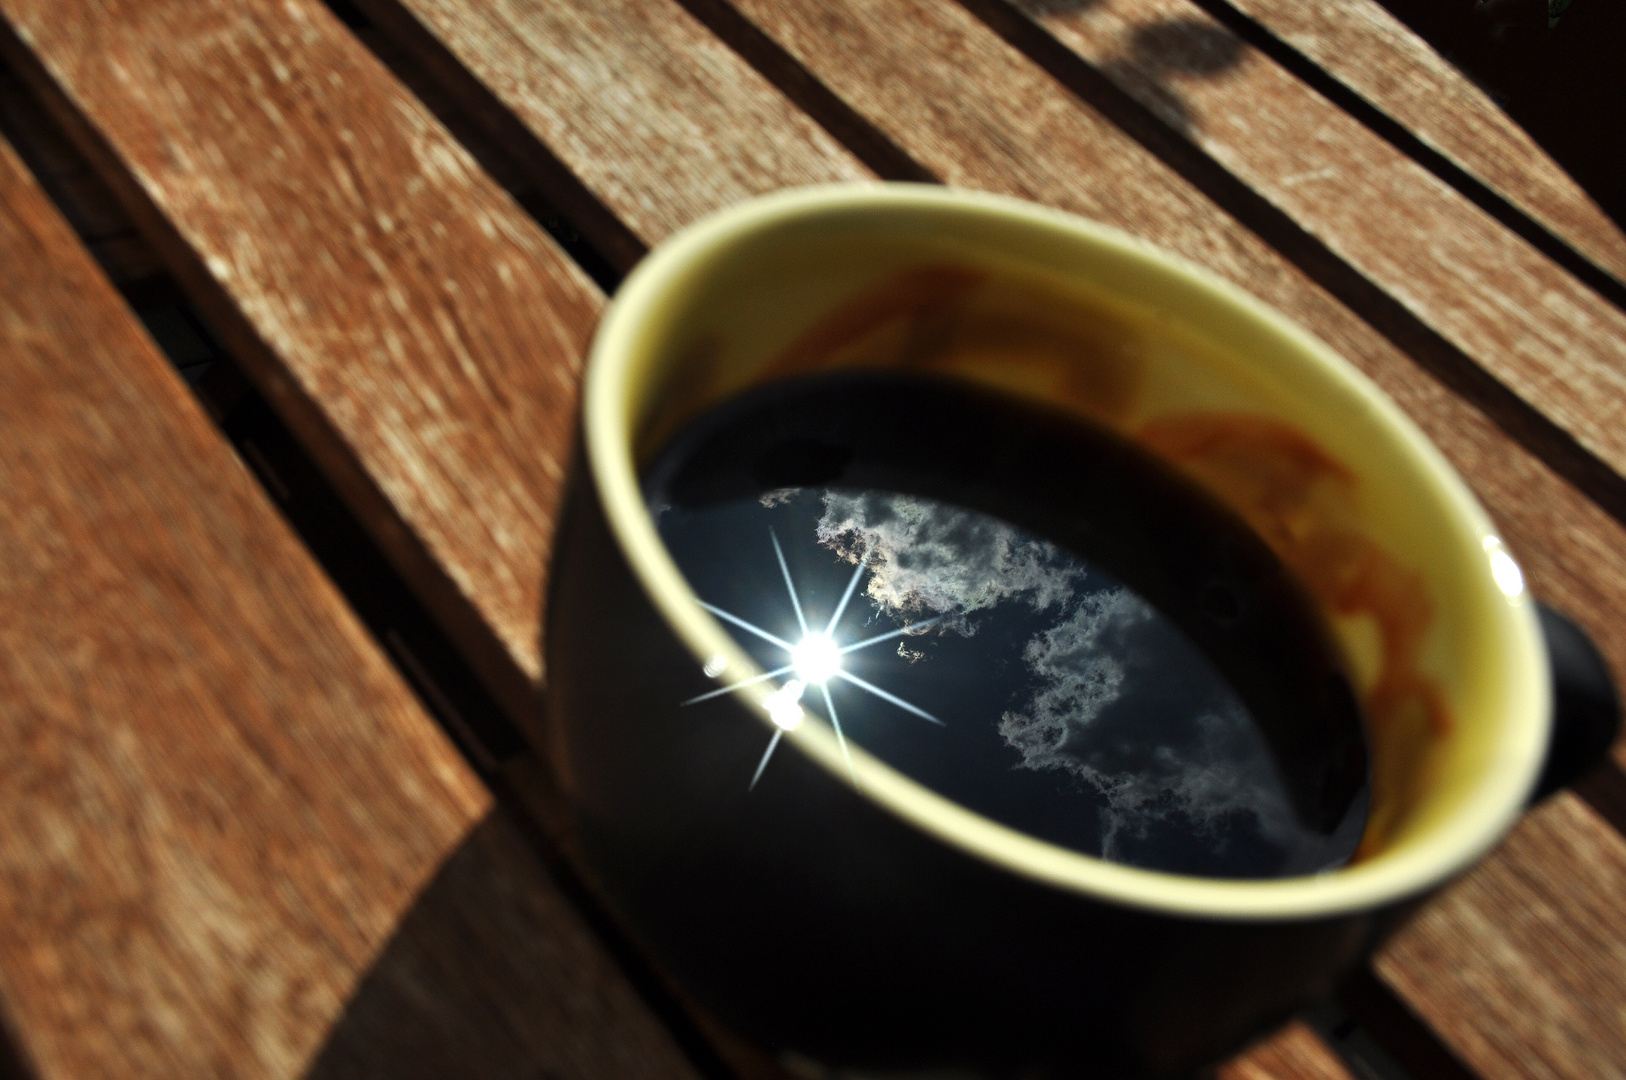 Habe Sonne im Kaffee